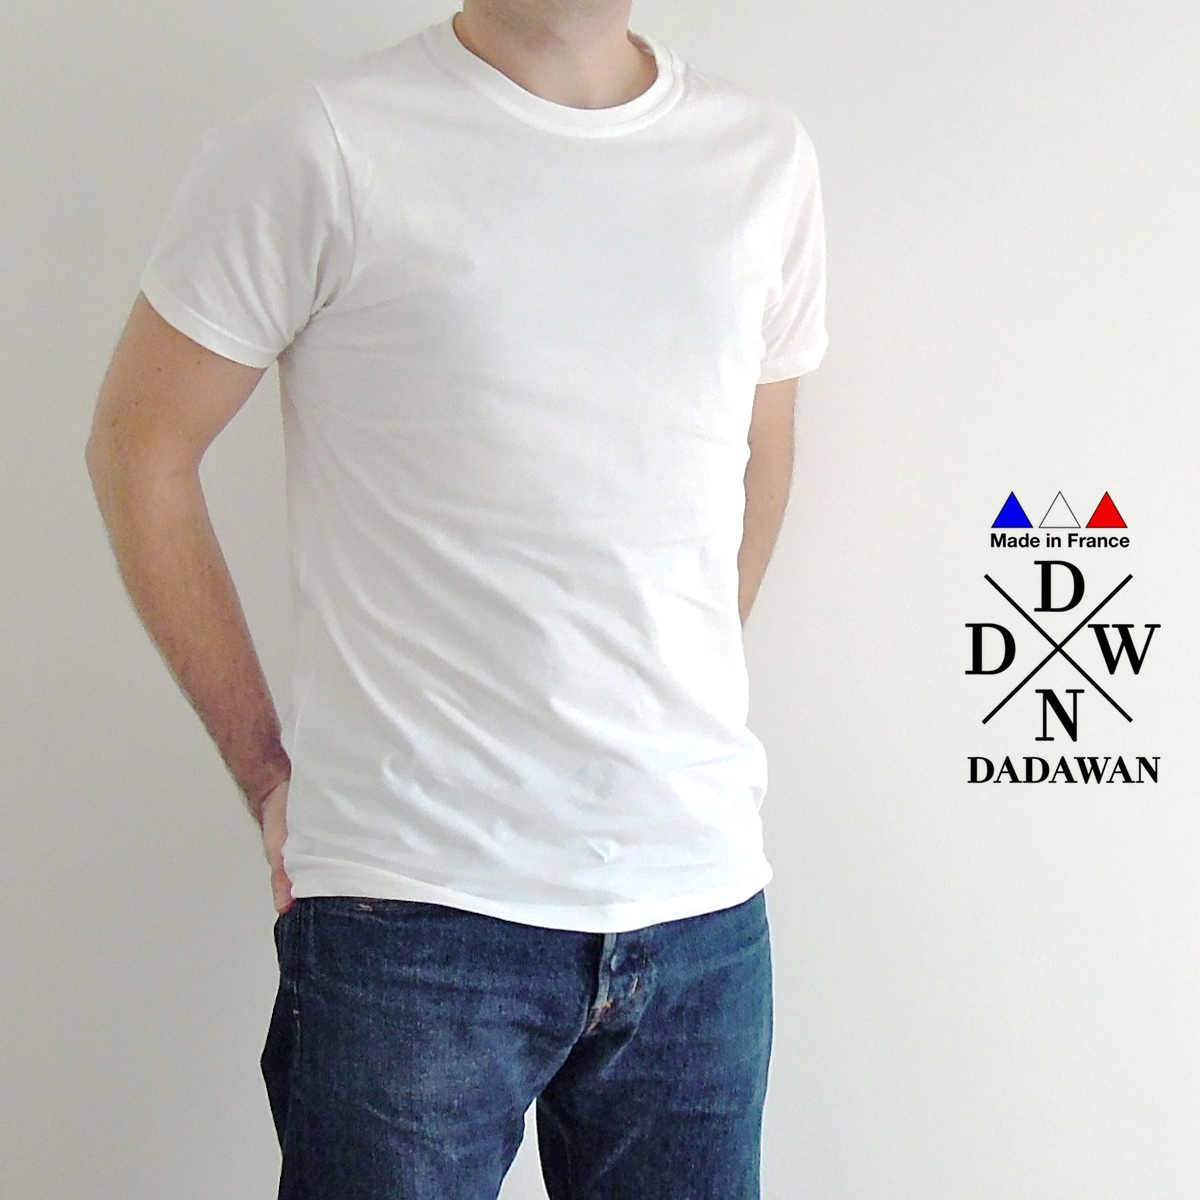 dadawan teeshirt blog t shirt homme fabriqu en france by dadawan. Black Bedroom Furniture Sets. Home Design Ideas